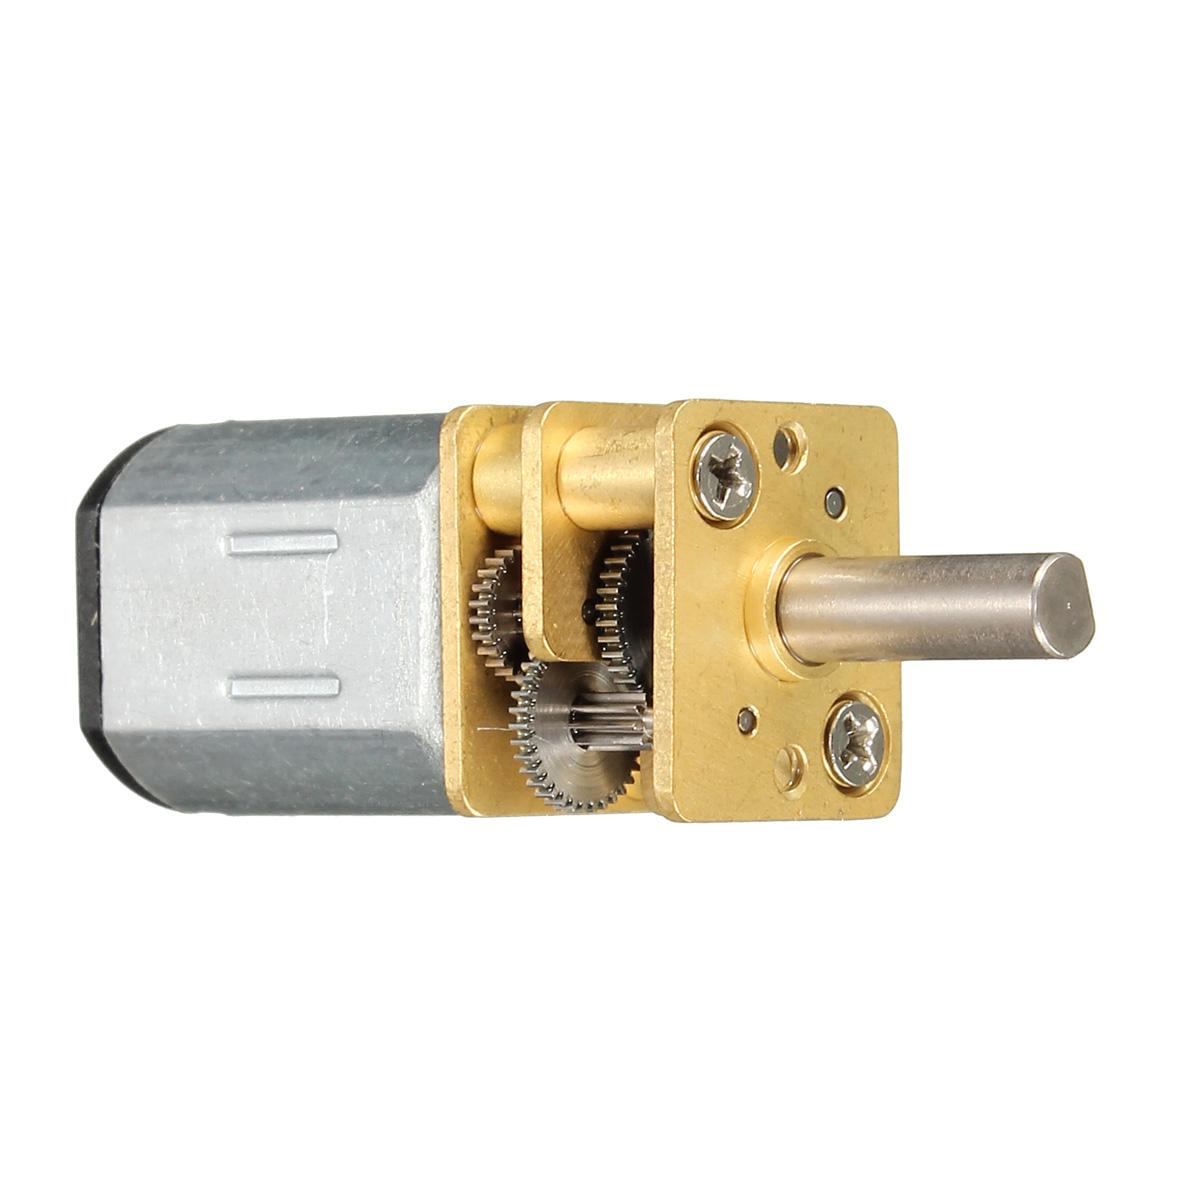 N20-12V-60 RPM Micro Metal Gear-box DC Motor